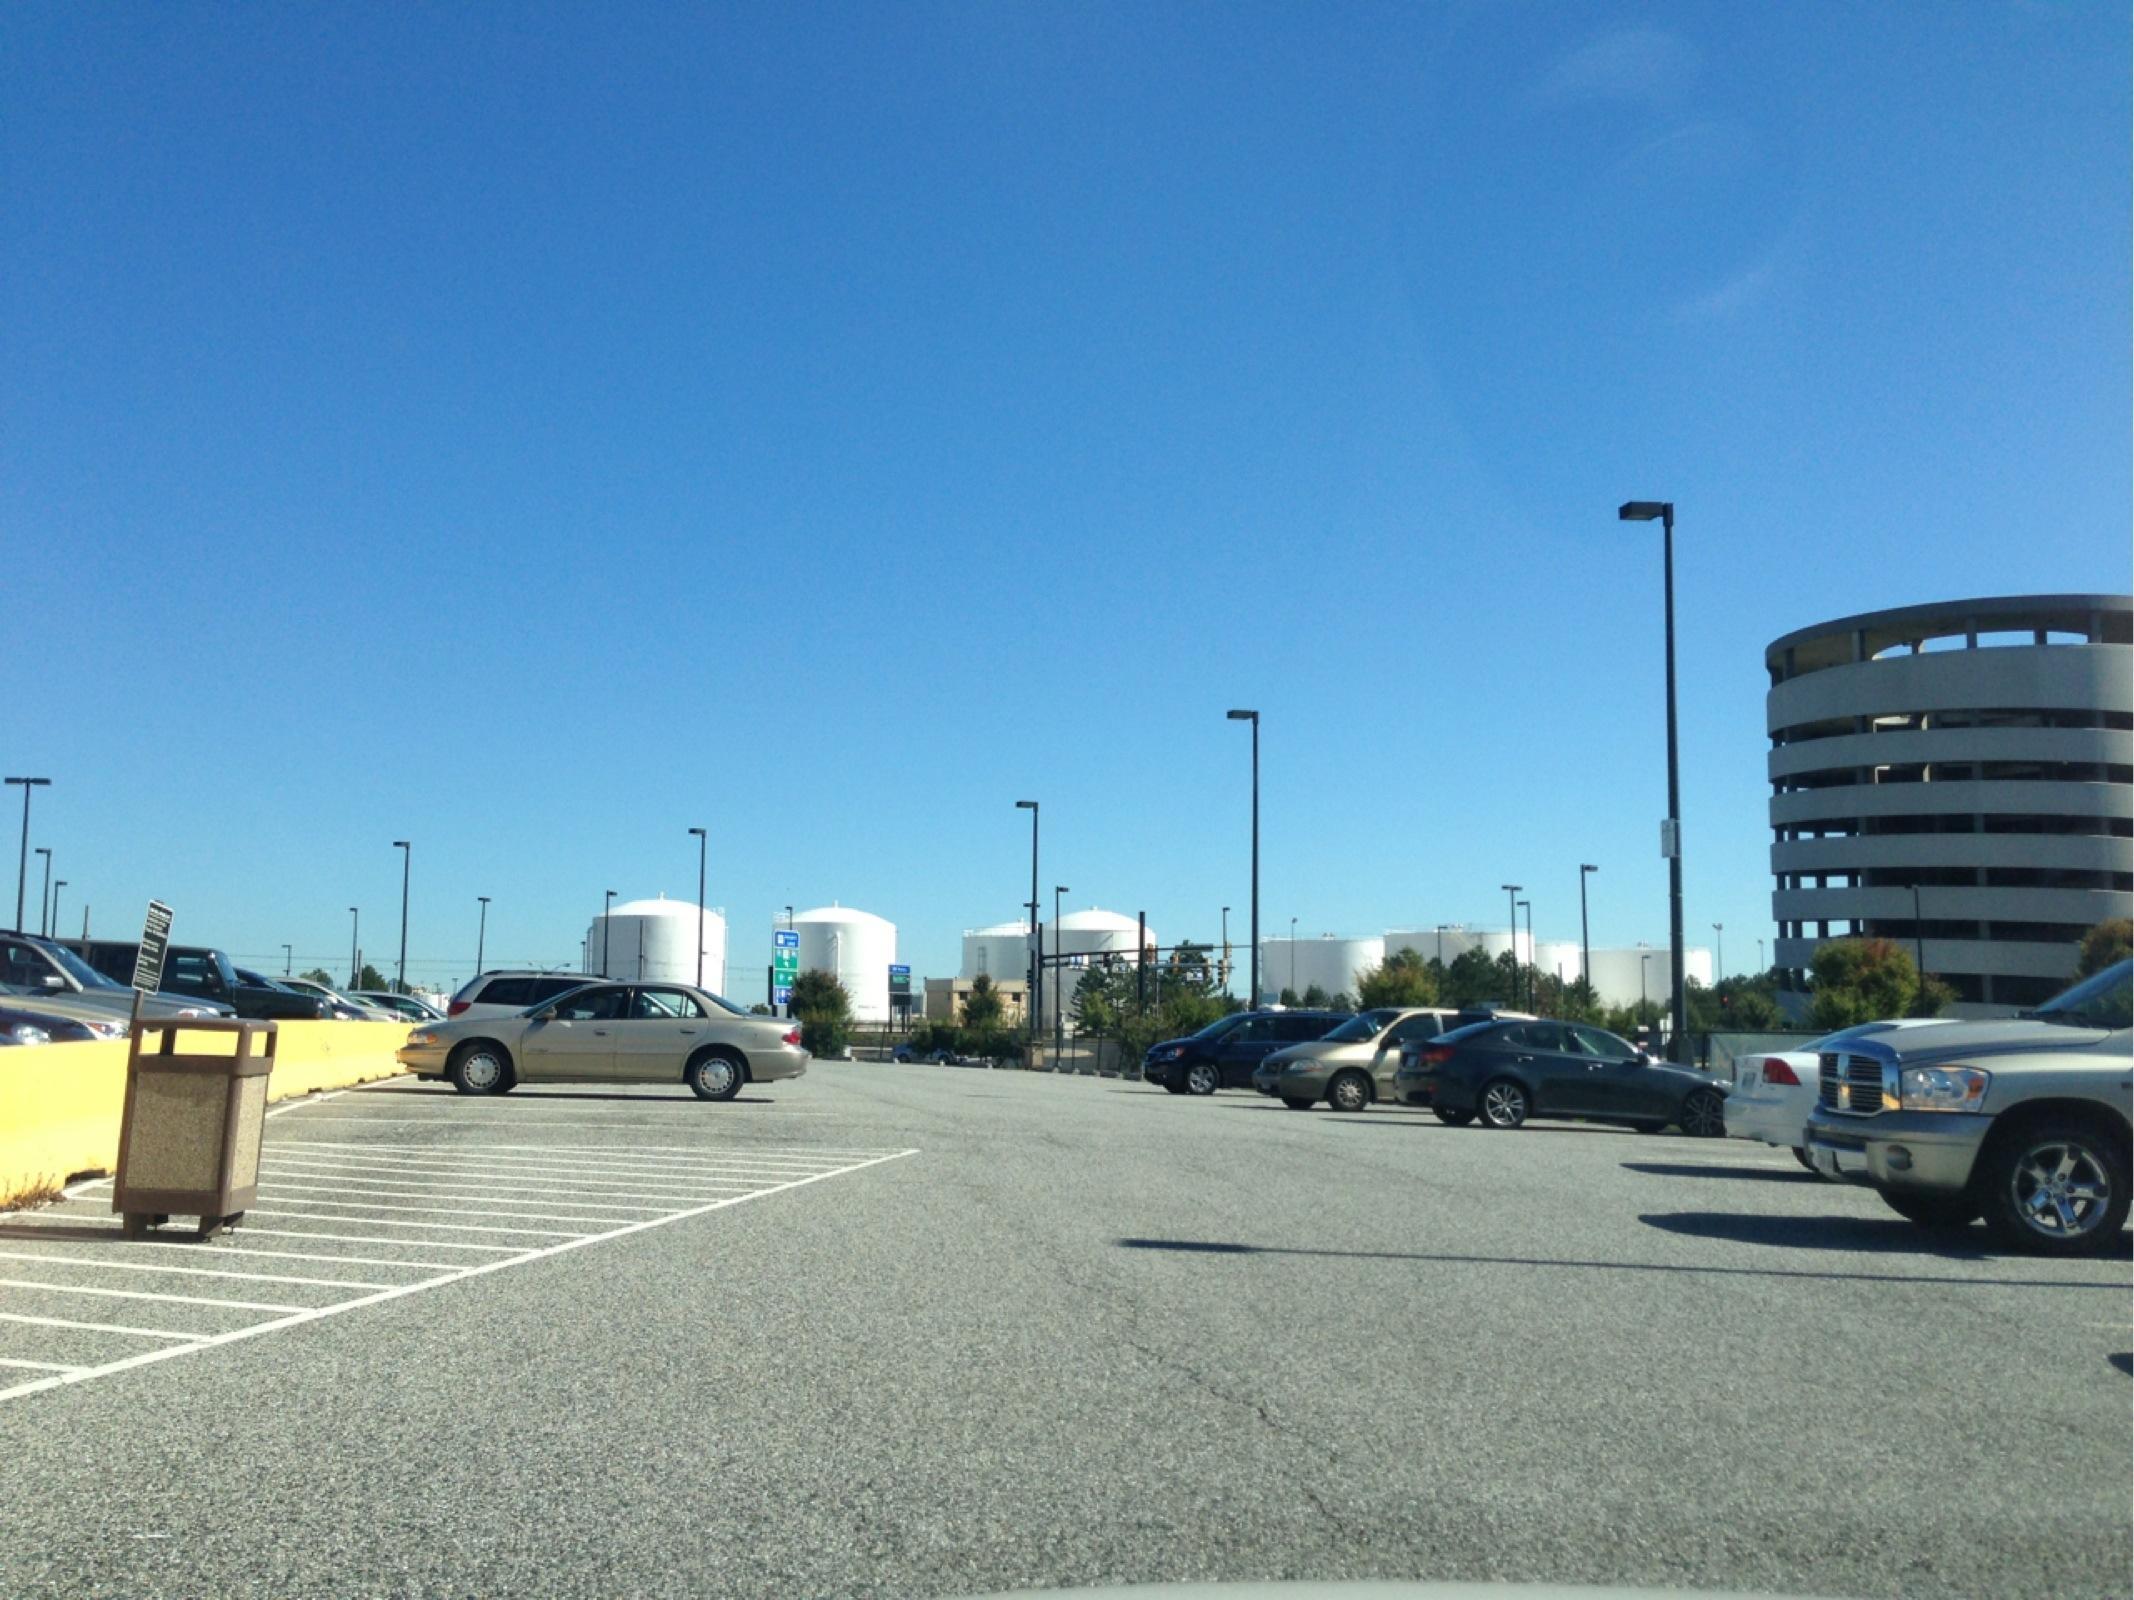 Bwi cell phone lot parking in glen burnie parkme for Department of motor vehicles glen burnie